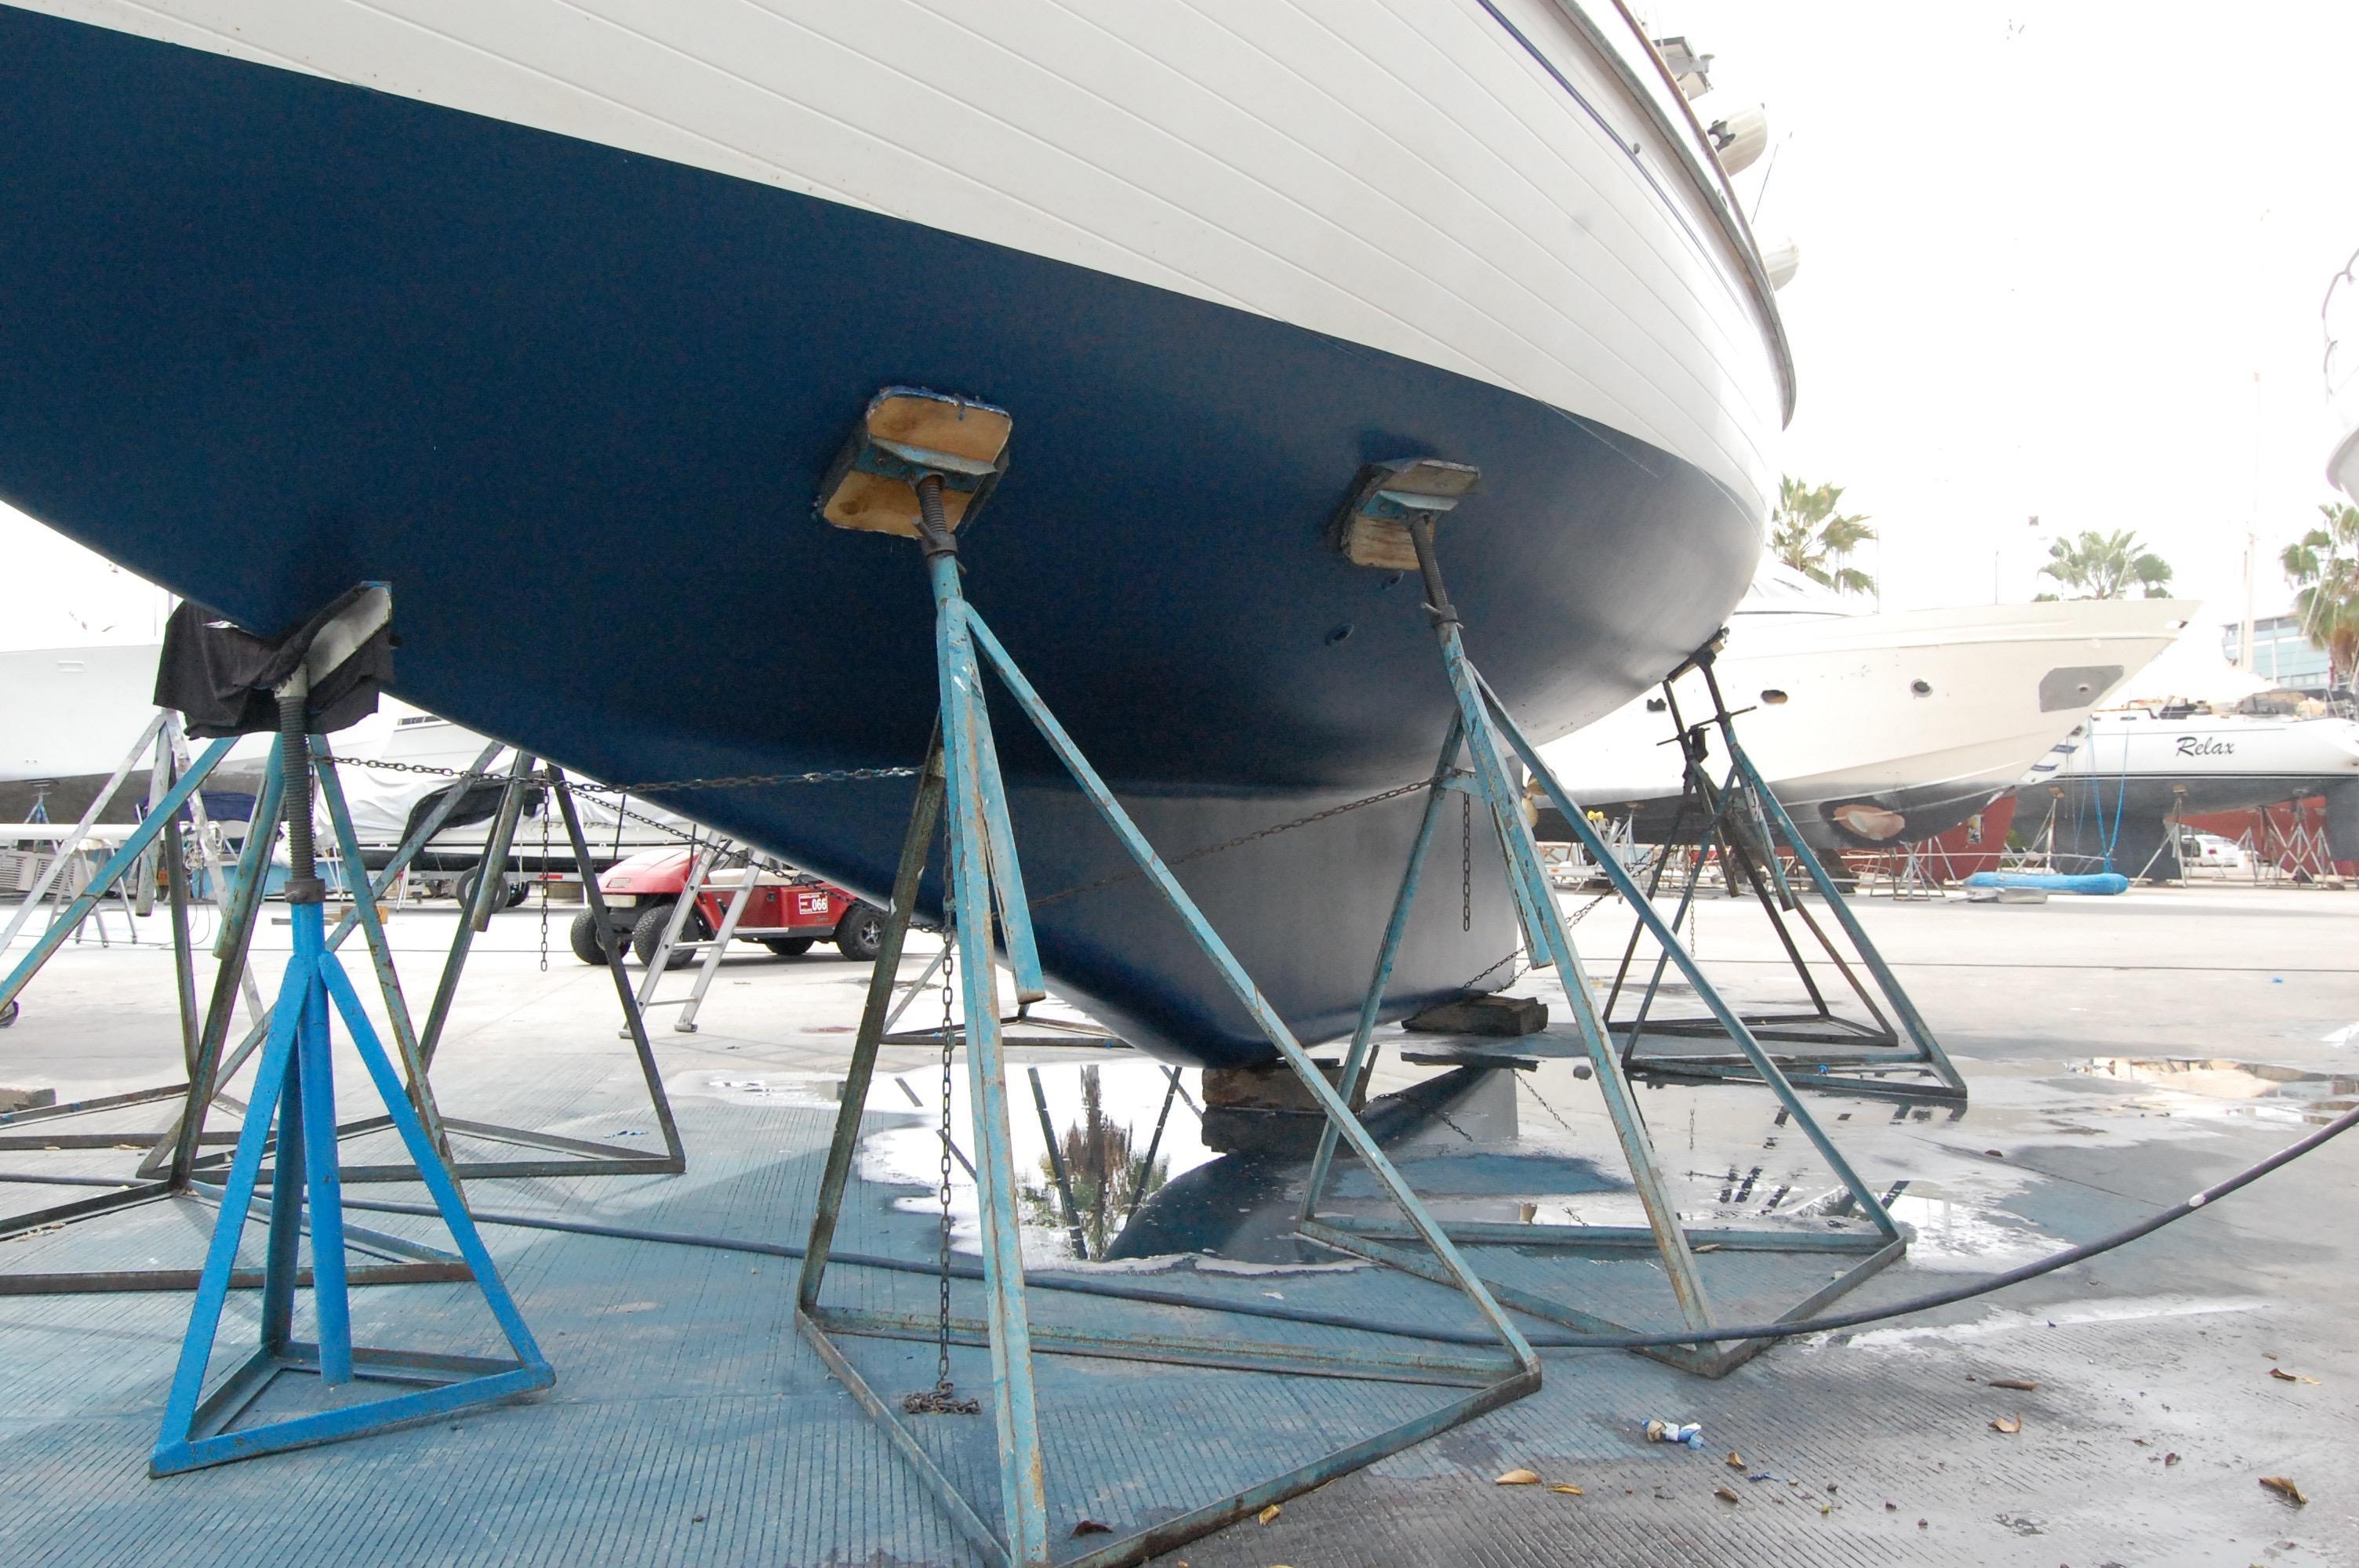 37' Tayana Cutter+spinnaker under sail